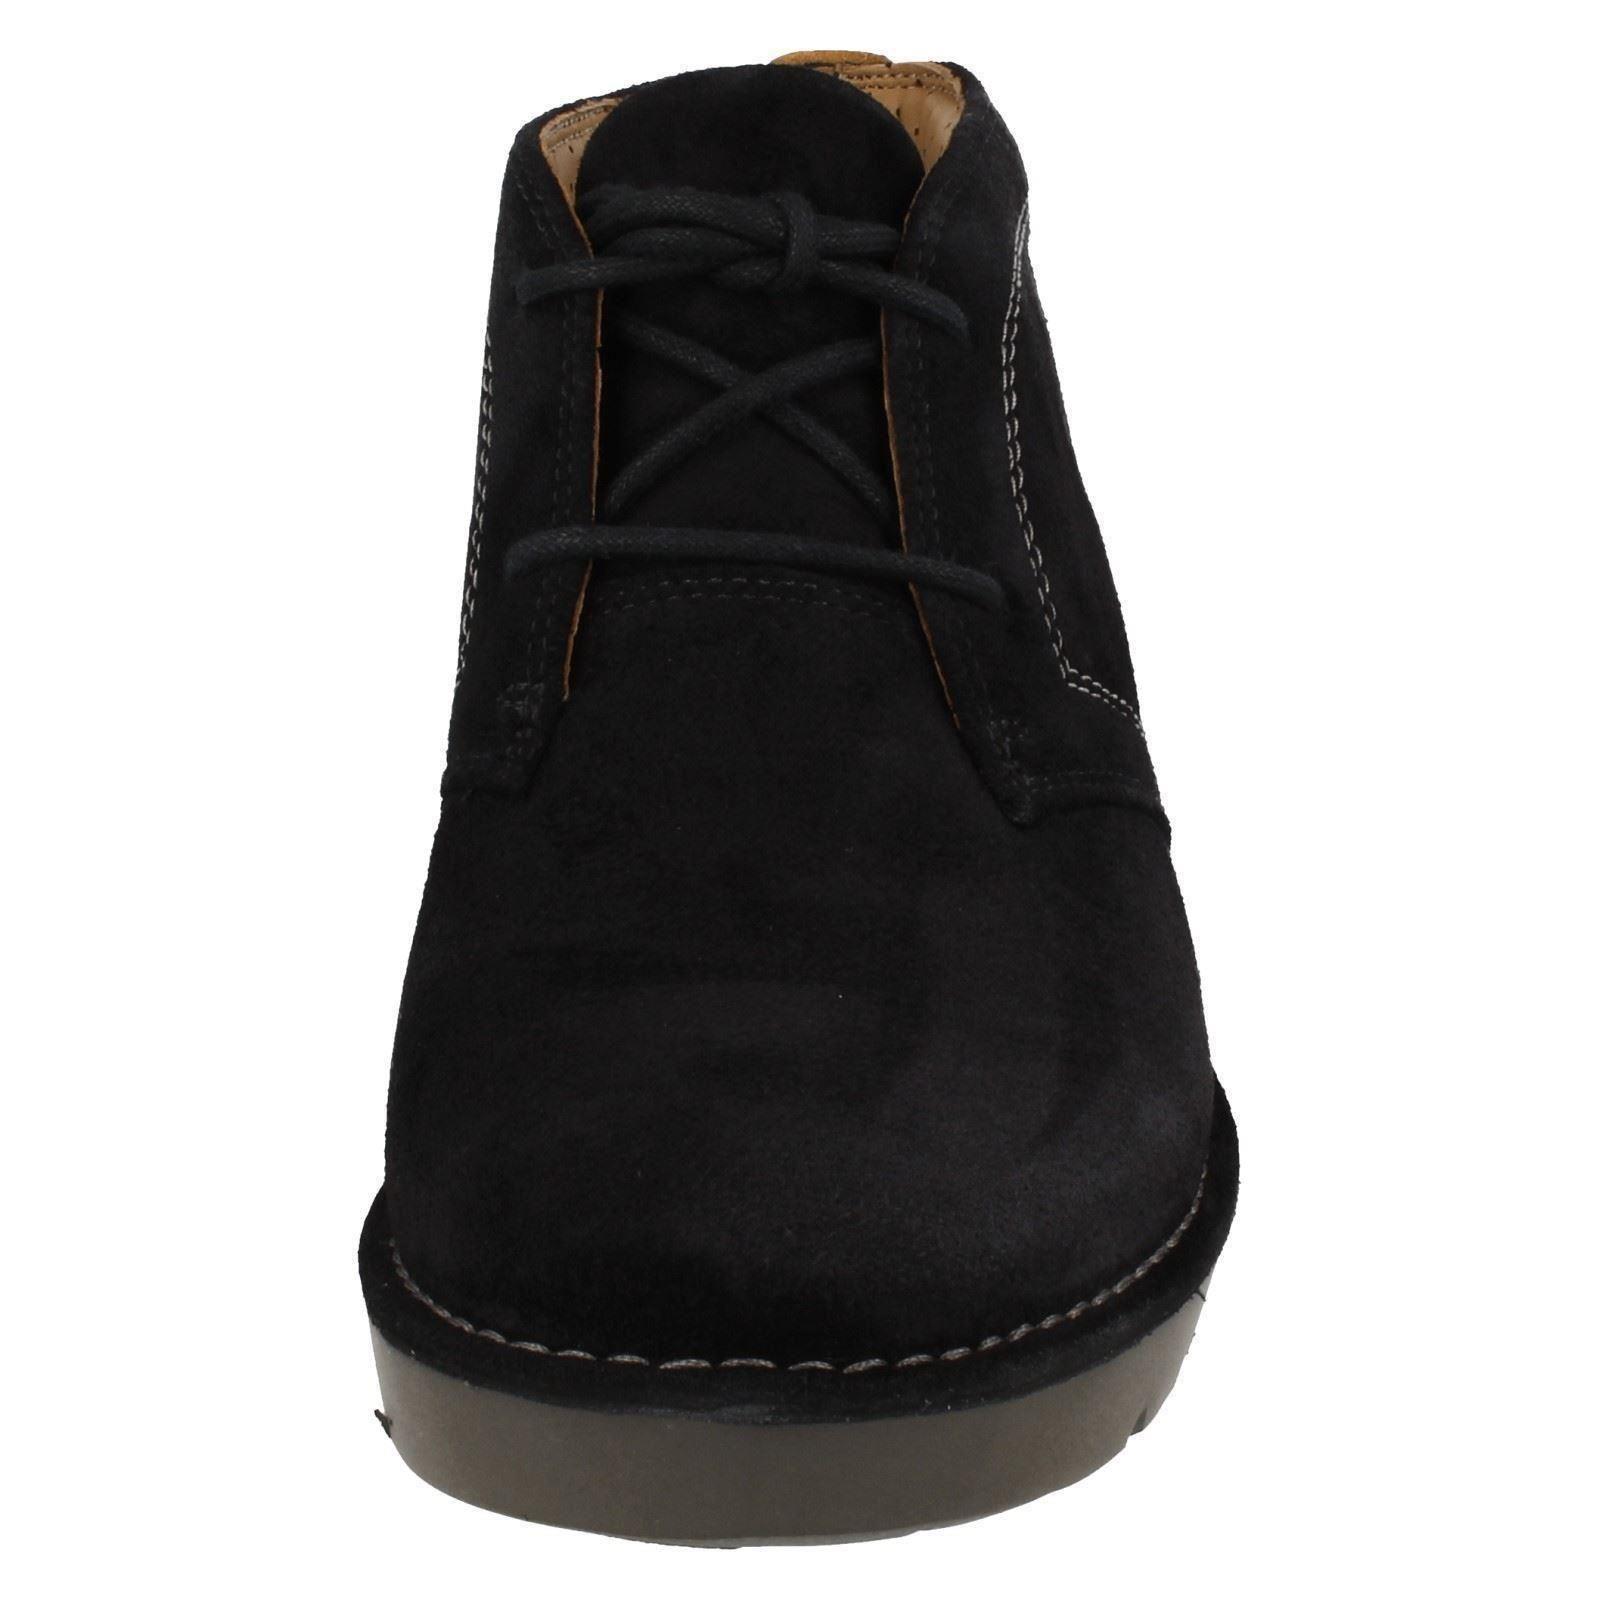 Ladies Clarks Unstructured Un Astin Ankle Boots